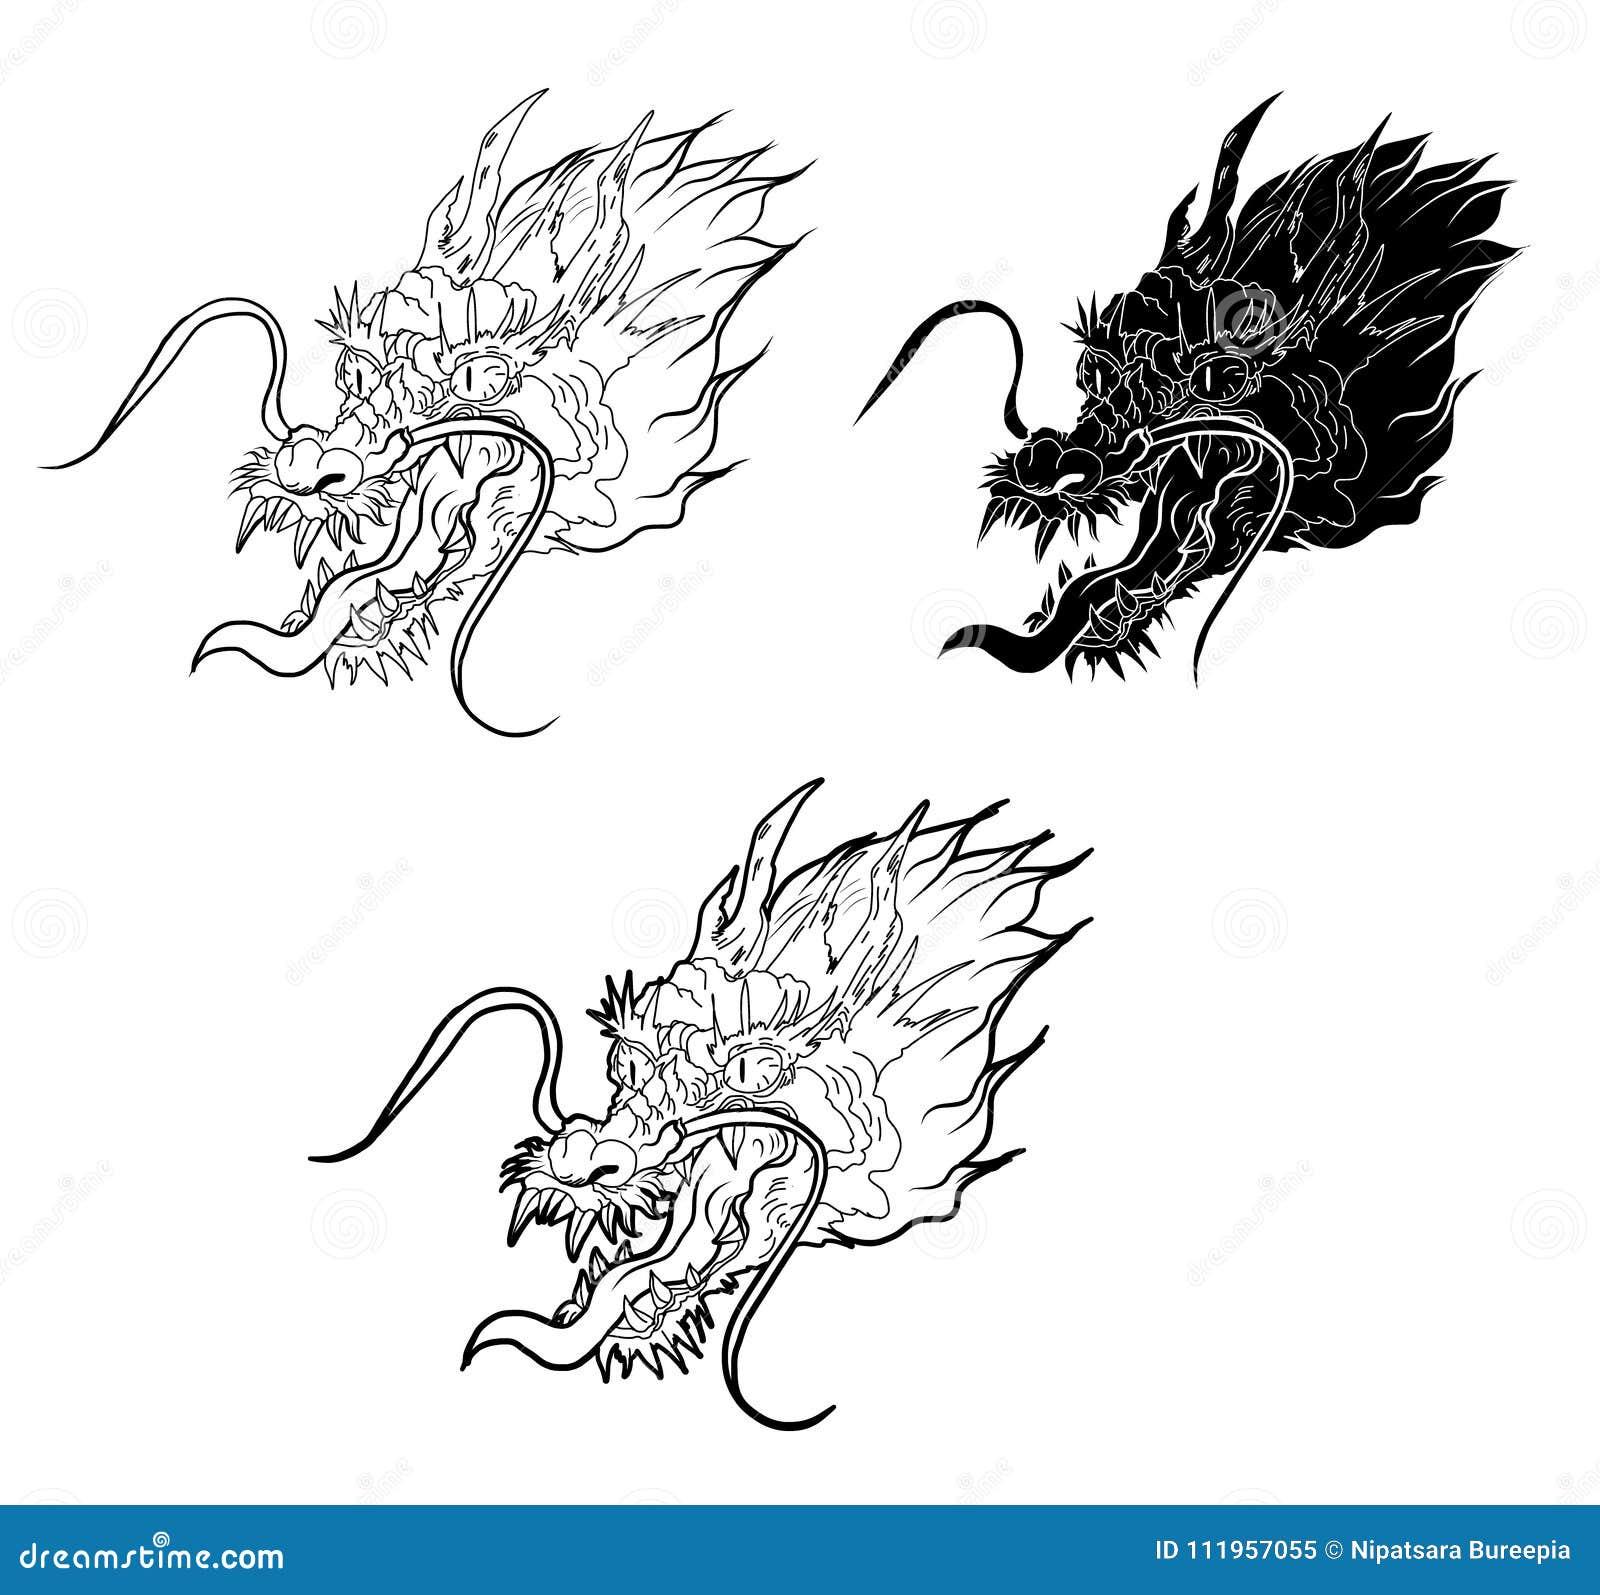 Tattoo Design Koi Dragon With Cherry Blossom And Wave In Circlekoi